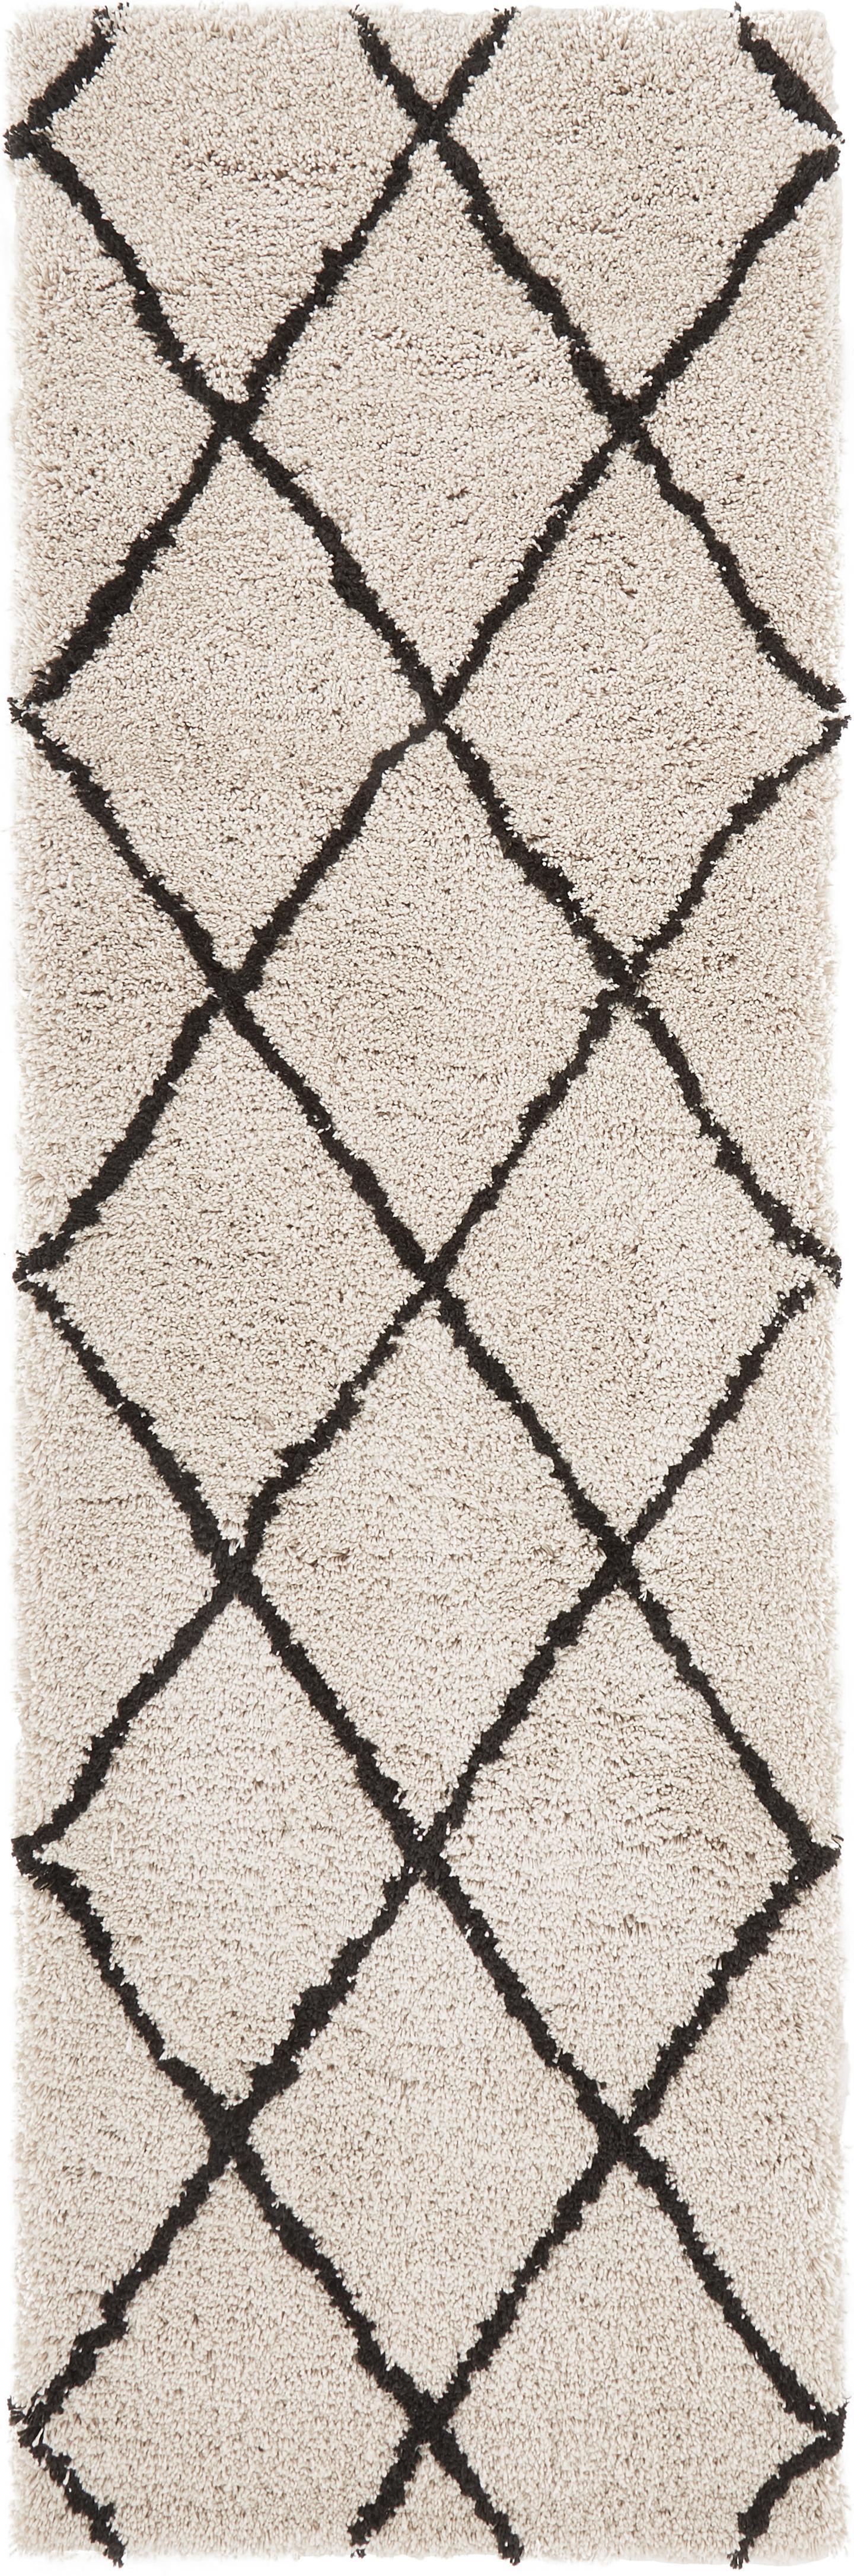 Alfombra artesanal de pelo largo Naima, Parte superior: 100%poliéster., Reverso: 100%algodón, Beige, negro, An 80 x L 250 cm